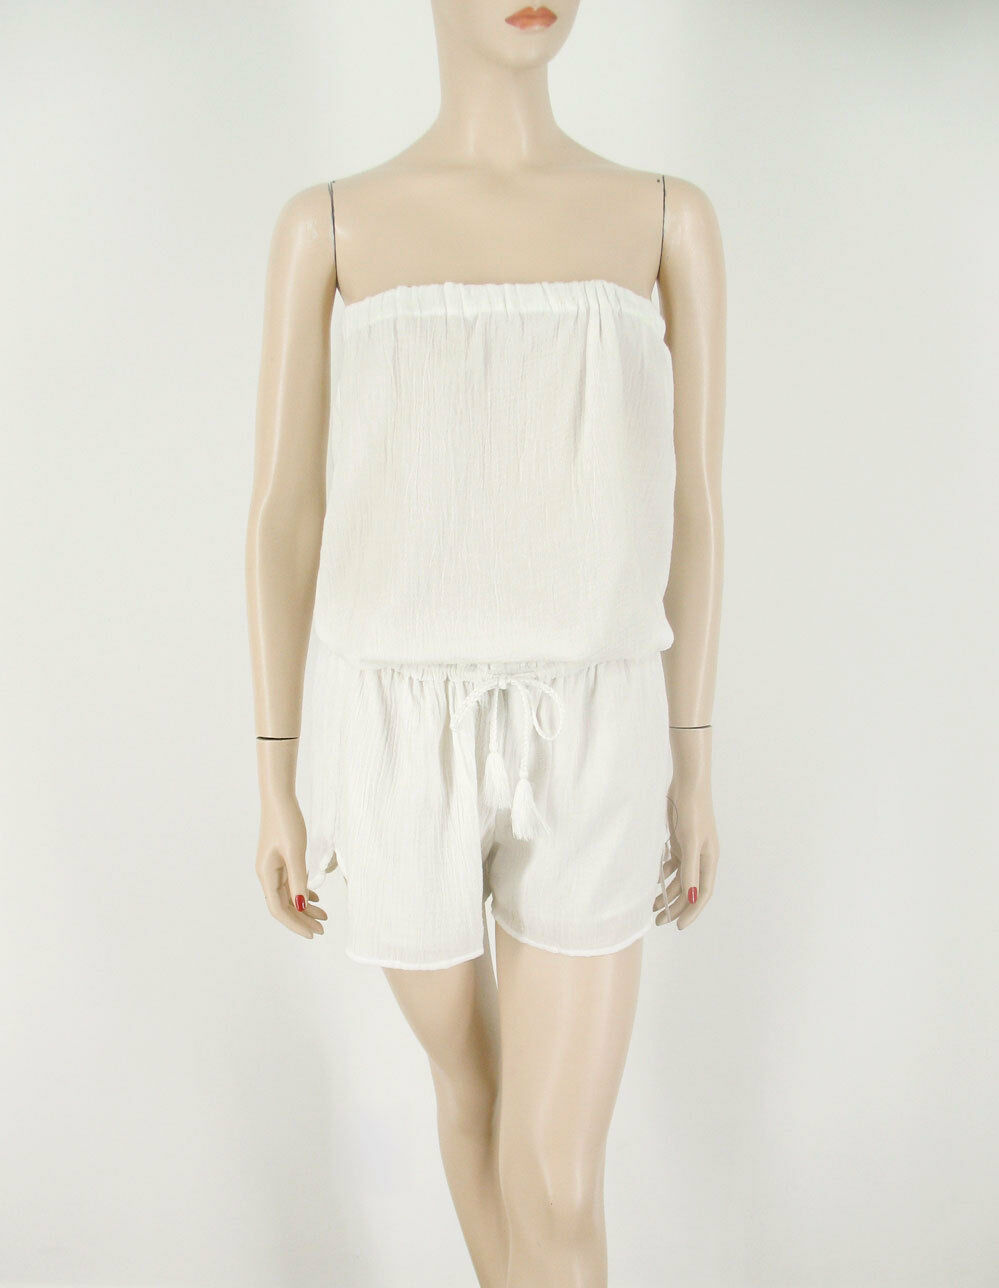 Soft Joie Connely B Romper in Porcelain White L  188 9051 BM9